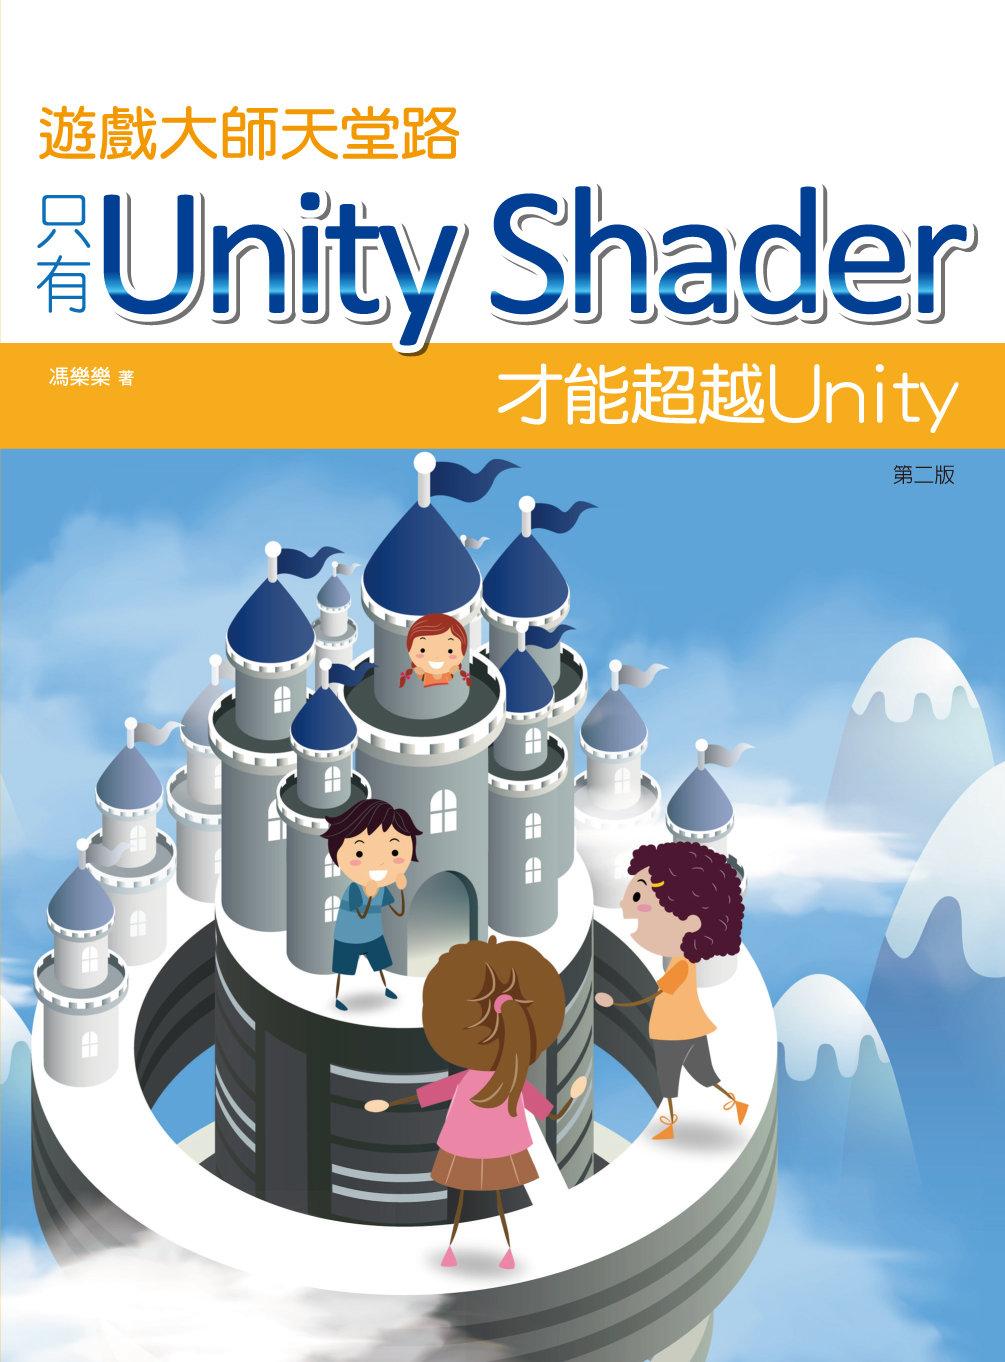 遊戲大師天堂路:只有 Unity Shader 才能超越 Unity, 2/e-preview-1